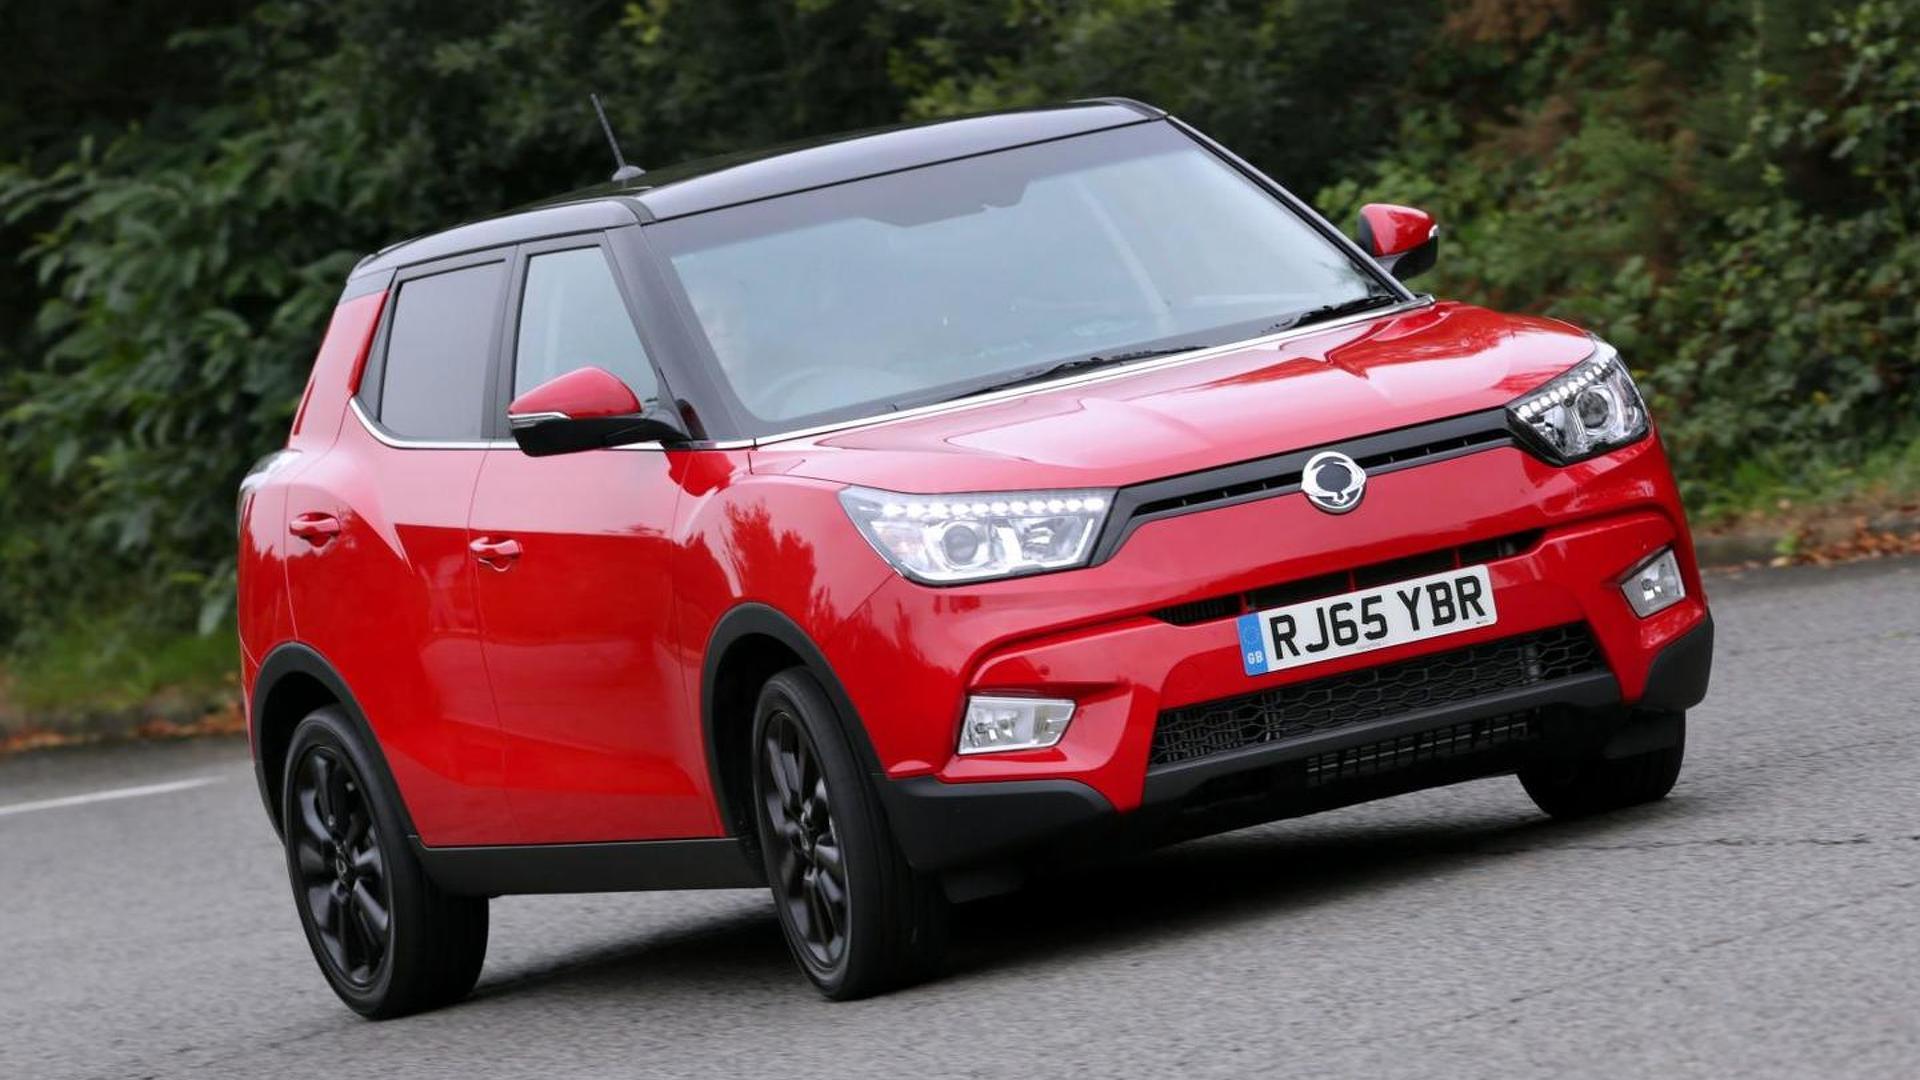 Ssangyong planning U.S. sales of Tivoli and Korando SUVs by 2020